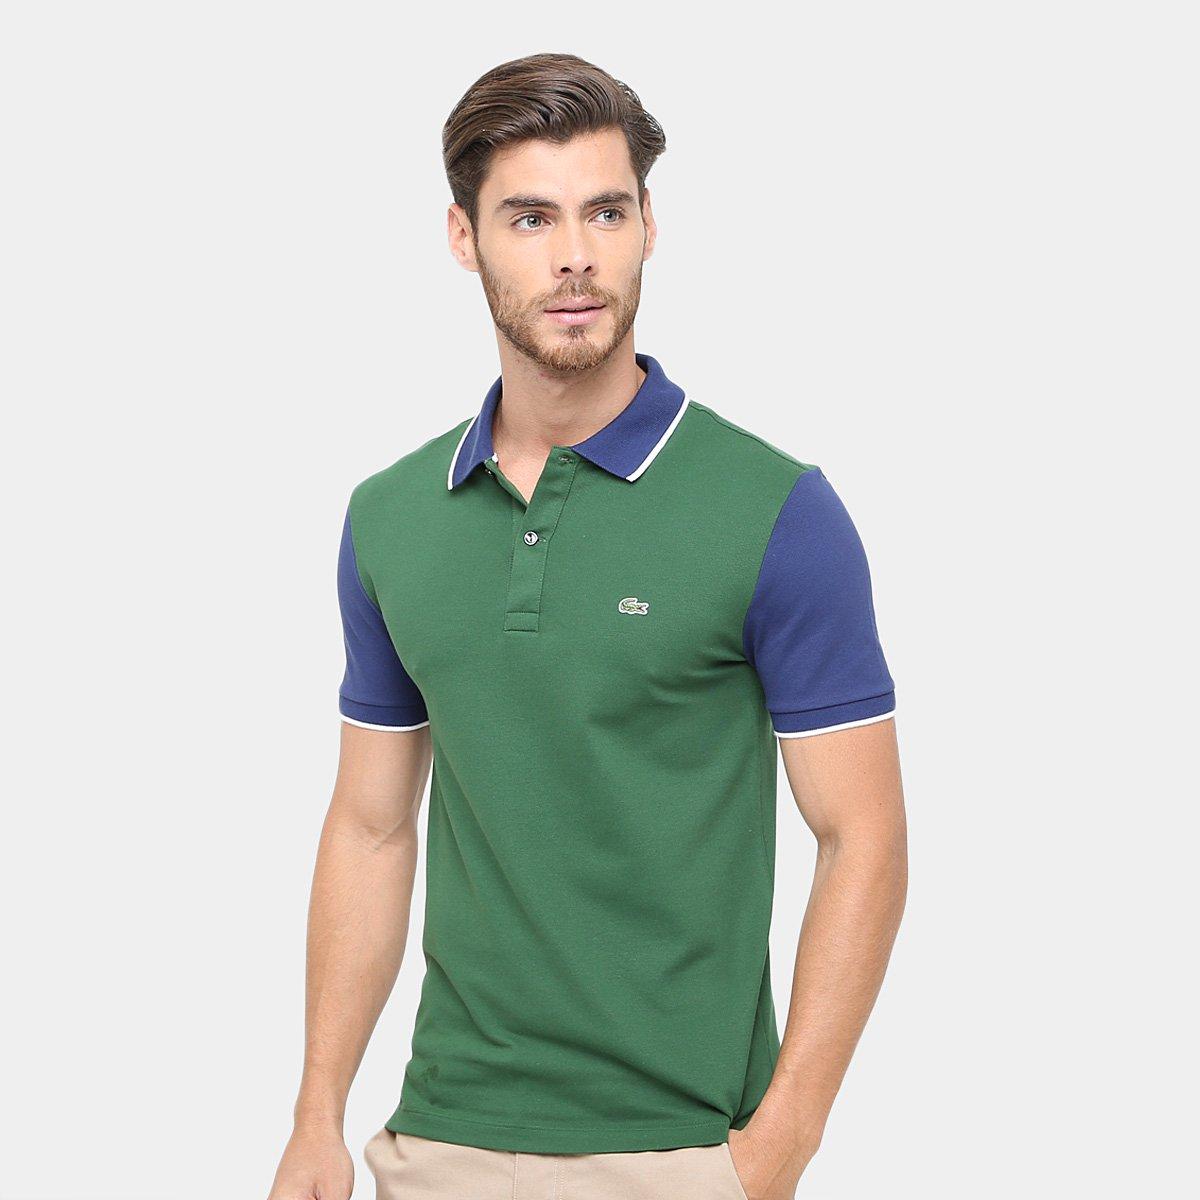 371580a9b1 Camisa Polo Lacoste Piquet Bicolor Slim Fit Masculina - Compre Agora ...